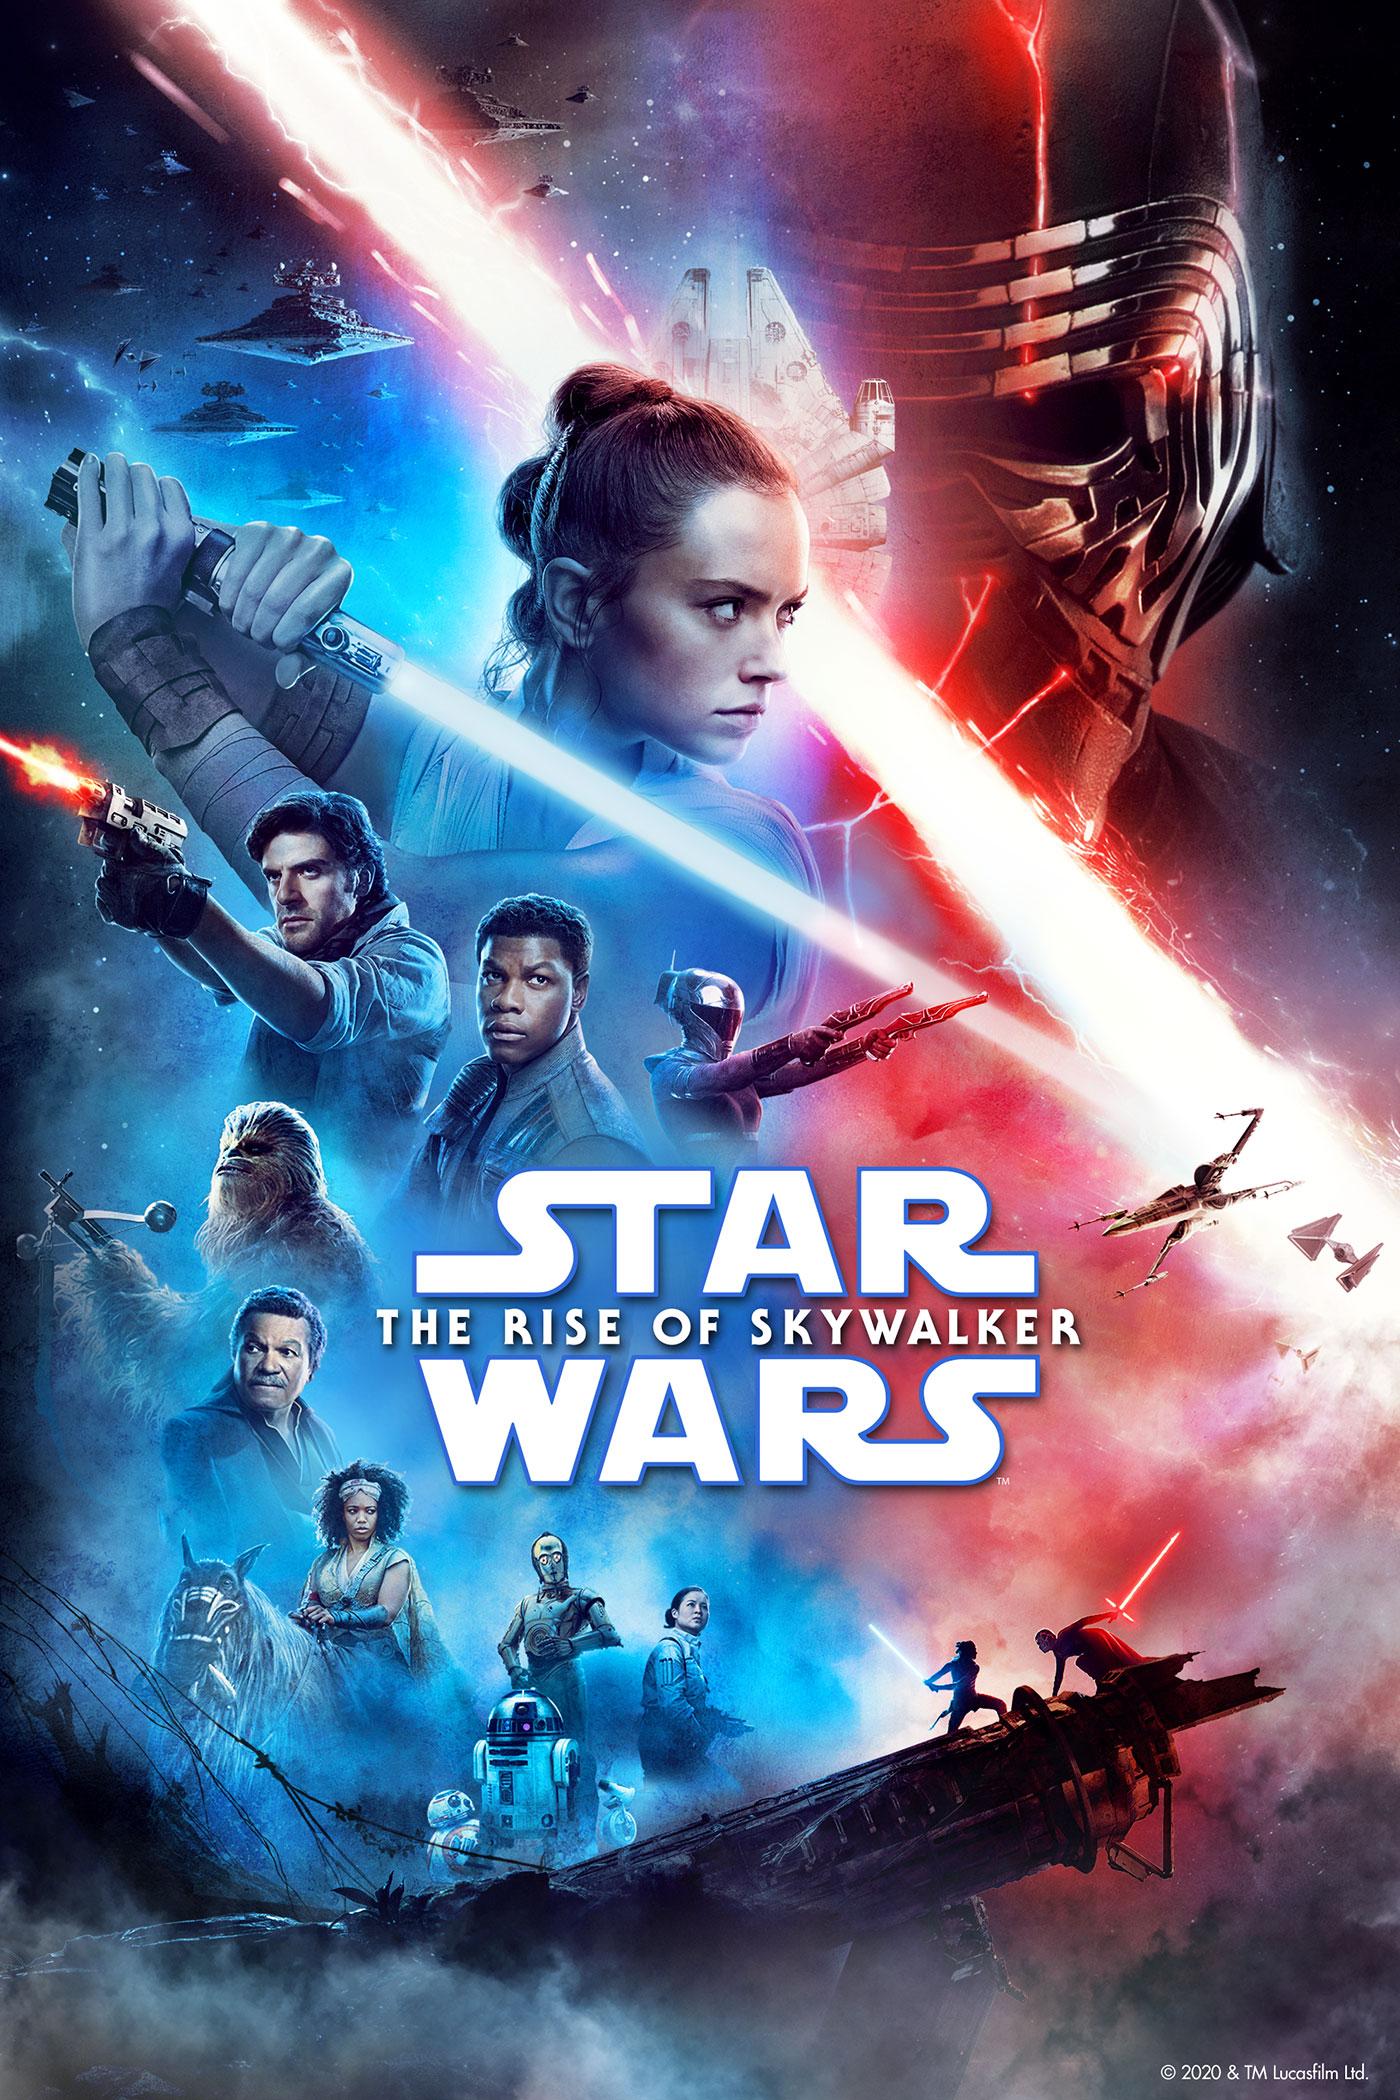 Star Wars The Rise Of Skywalker Buy Rent Or Watch On Fandangonow